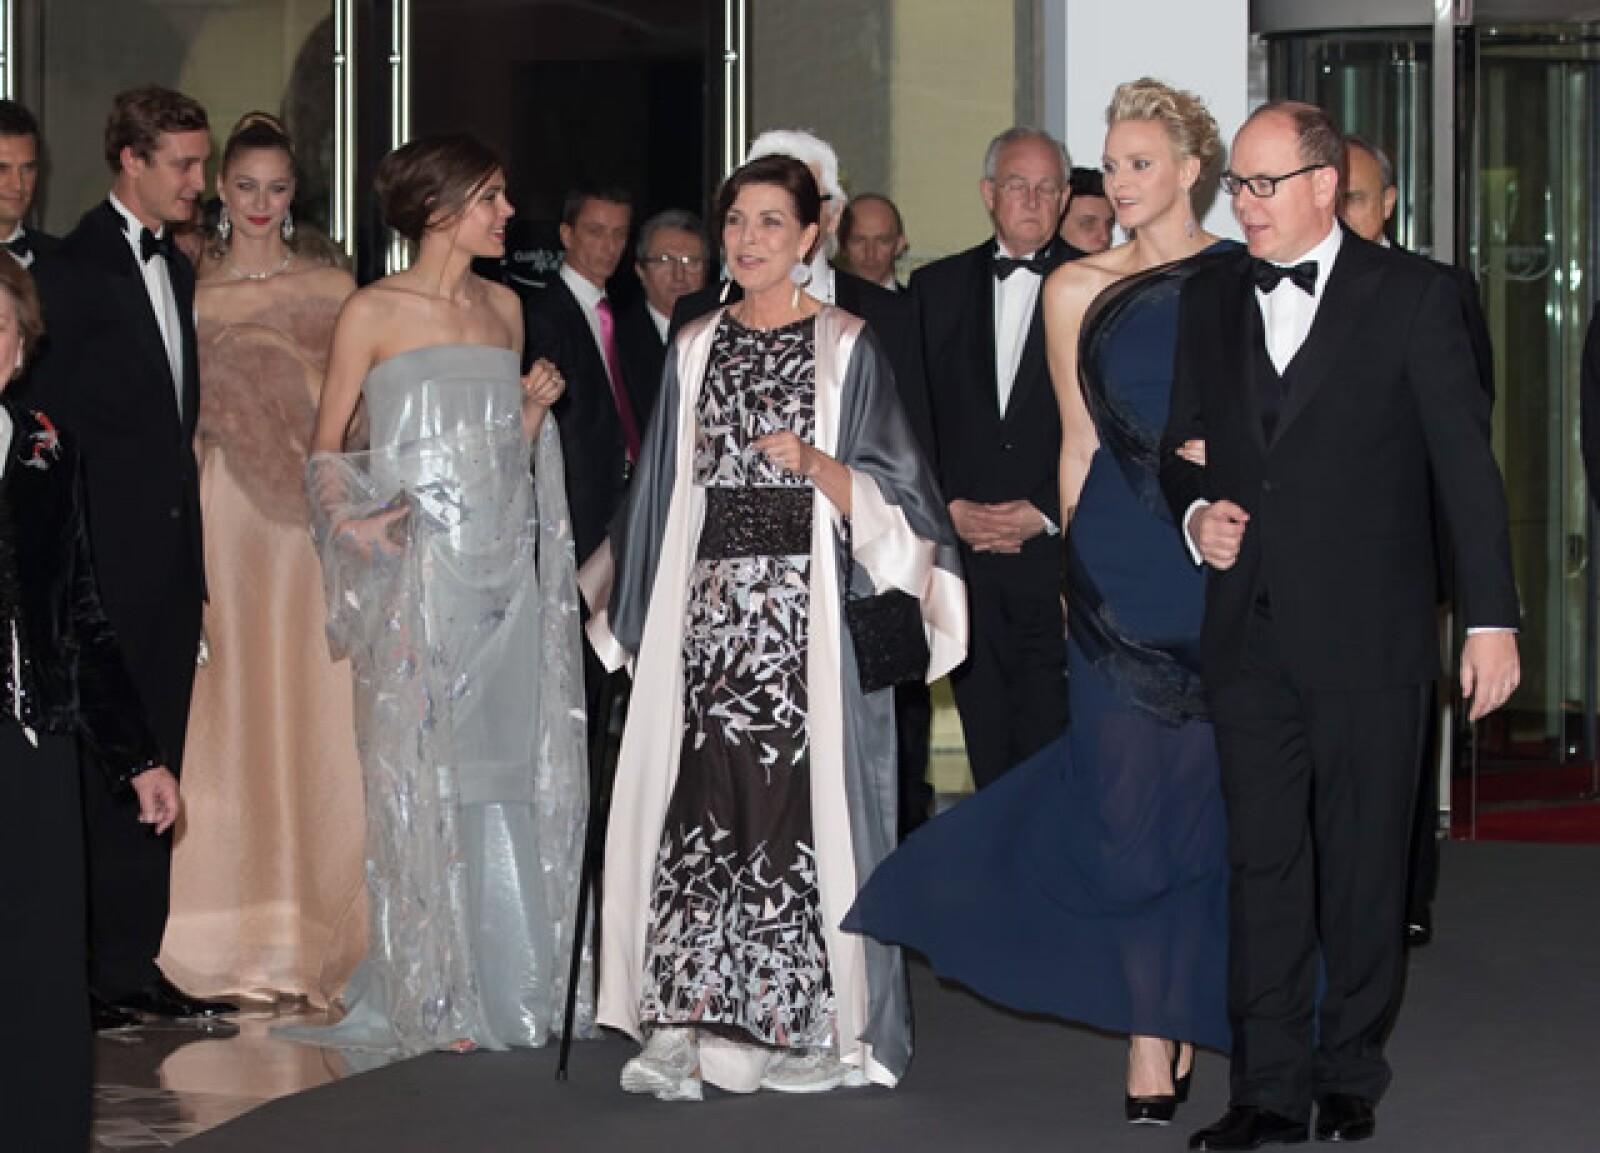 Pierre Casiraghi, Beatrice Borromeo, Carlota Casiraghi, princesa Carolina, Charlene y Alberto de Mónaco.